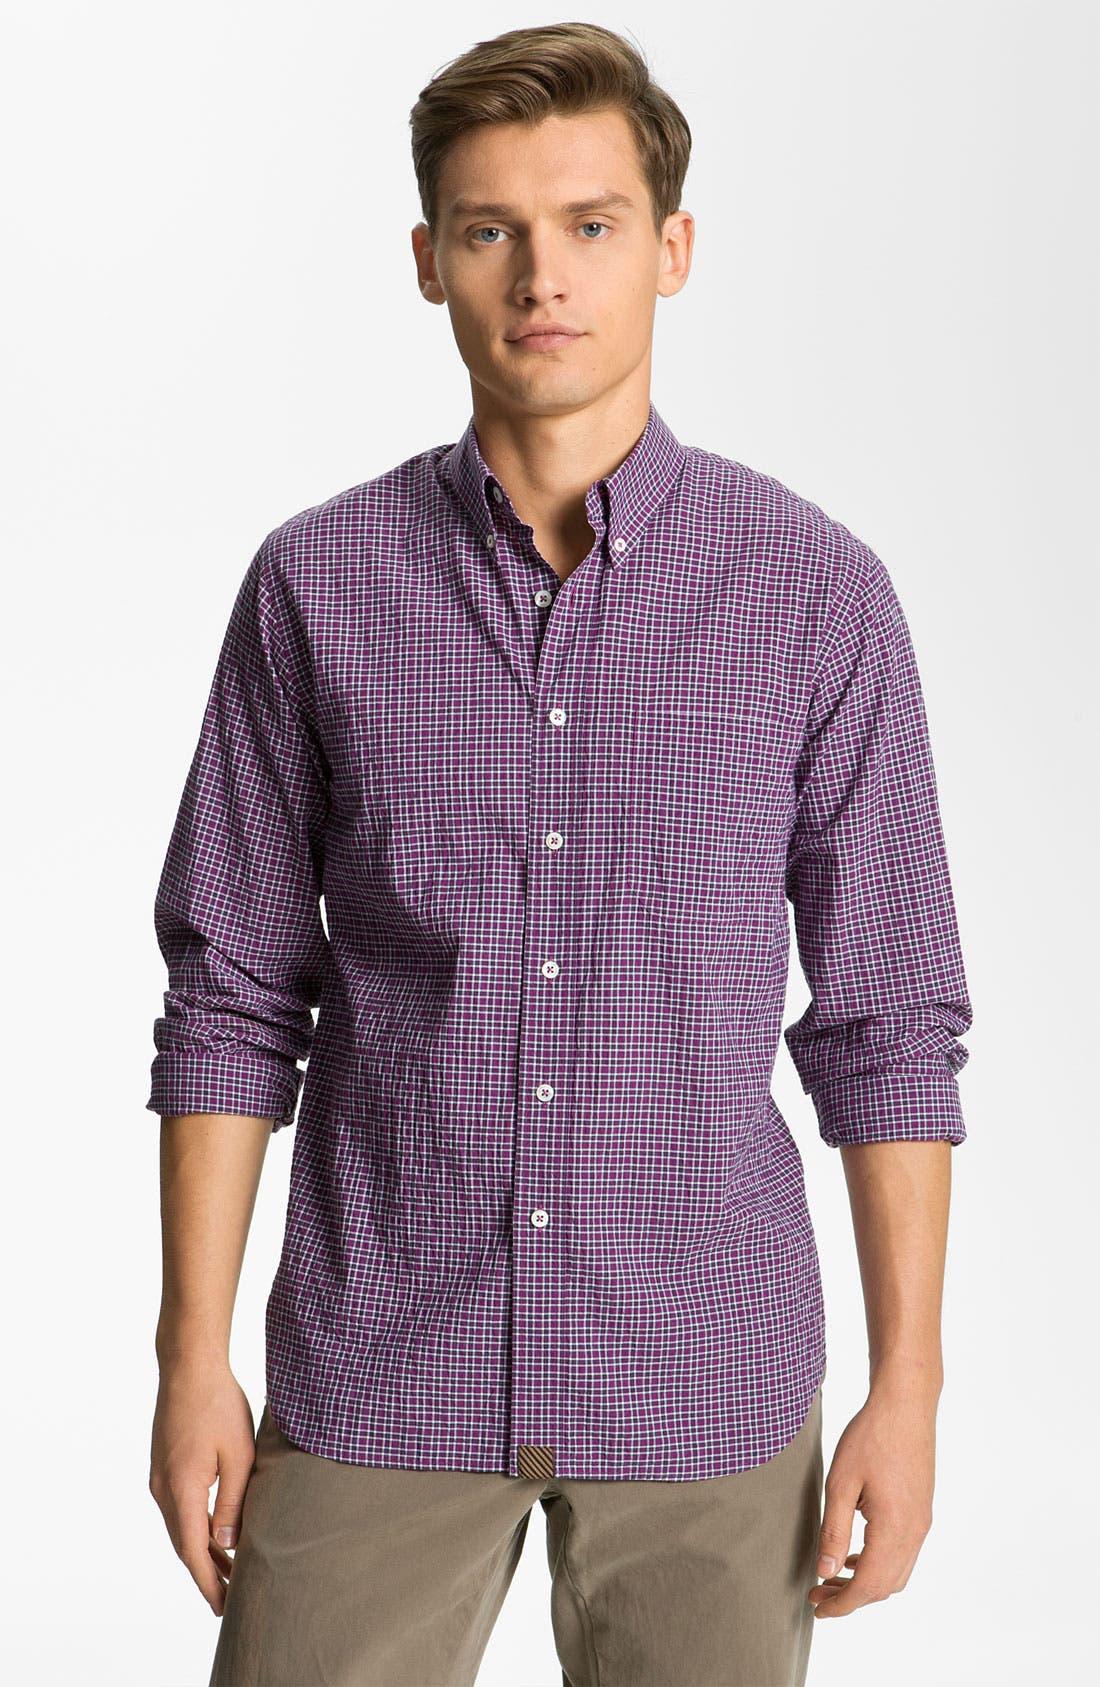 Alternate Image 1 Selected - Billy Reid 'Tuscumbia' Plaid Woven Shirt